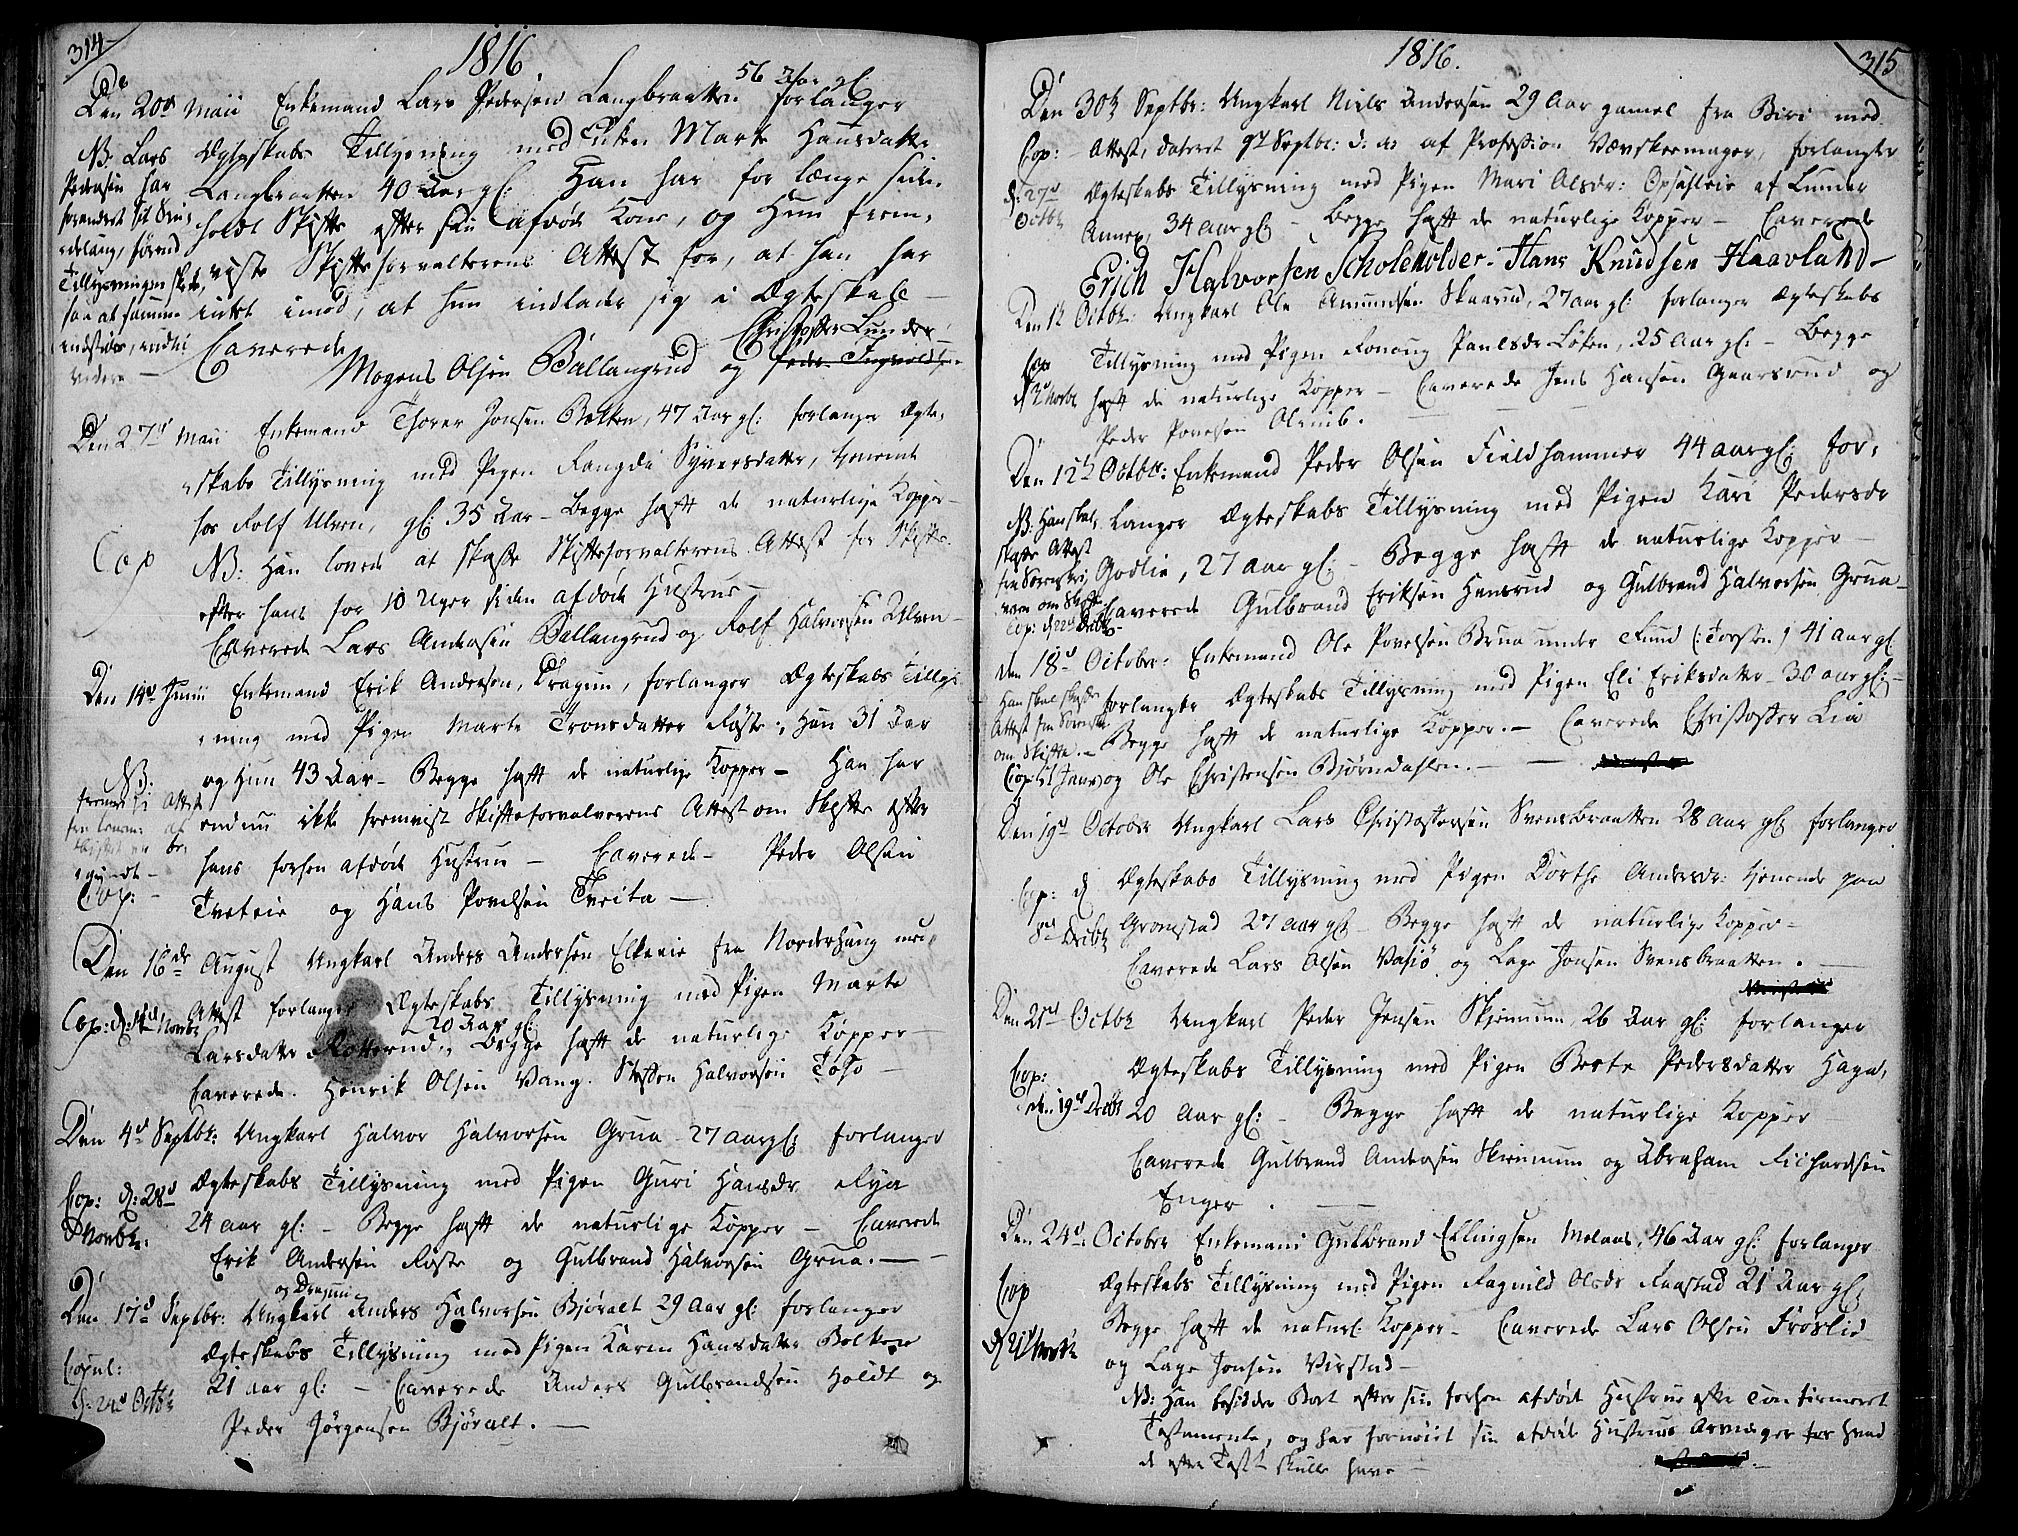 SAH, Jevnaker prestekontor, Ministerialbok nr. 4, 1800-1861, s. 314-315